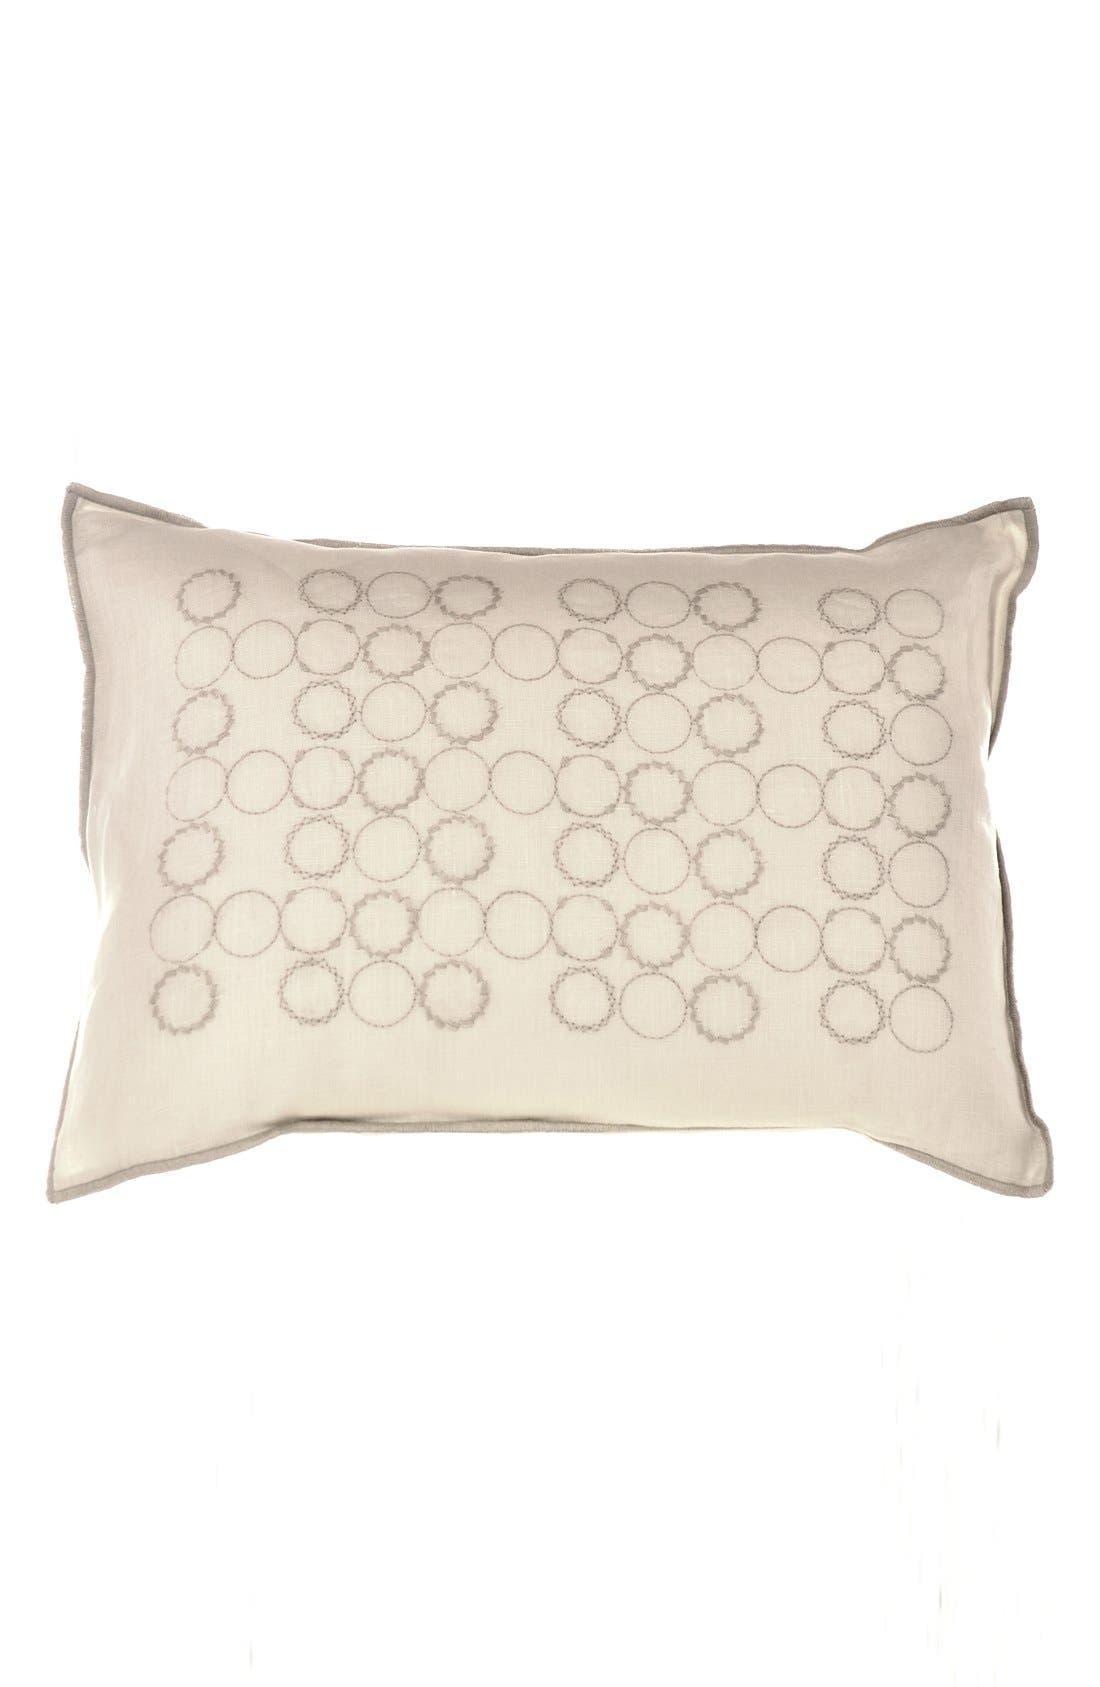 Alternate Image 1 Selected - Vera Wang Circle Embroidered Pillow